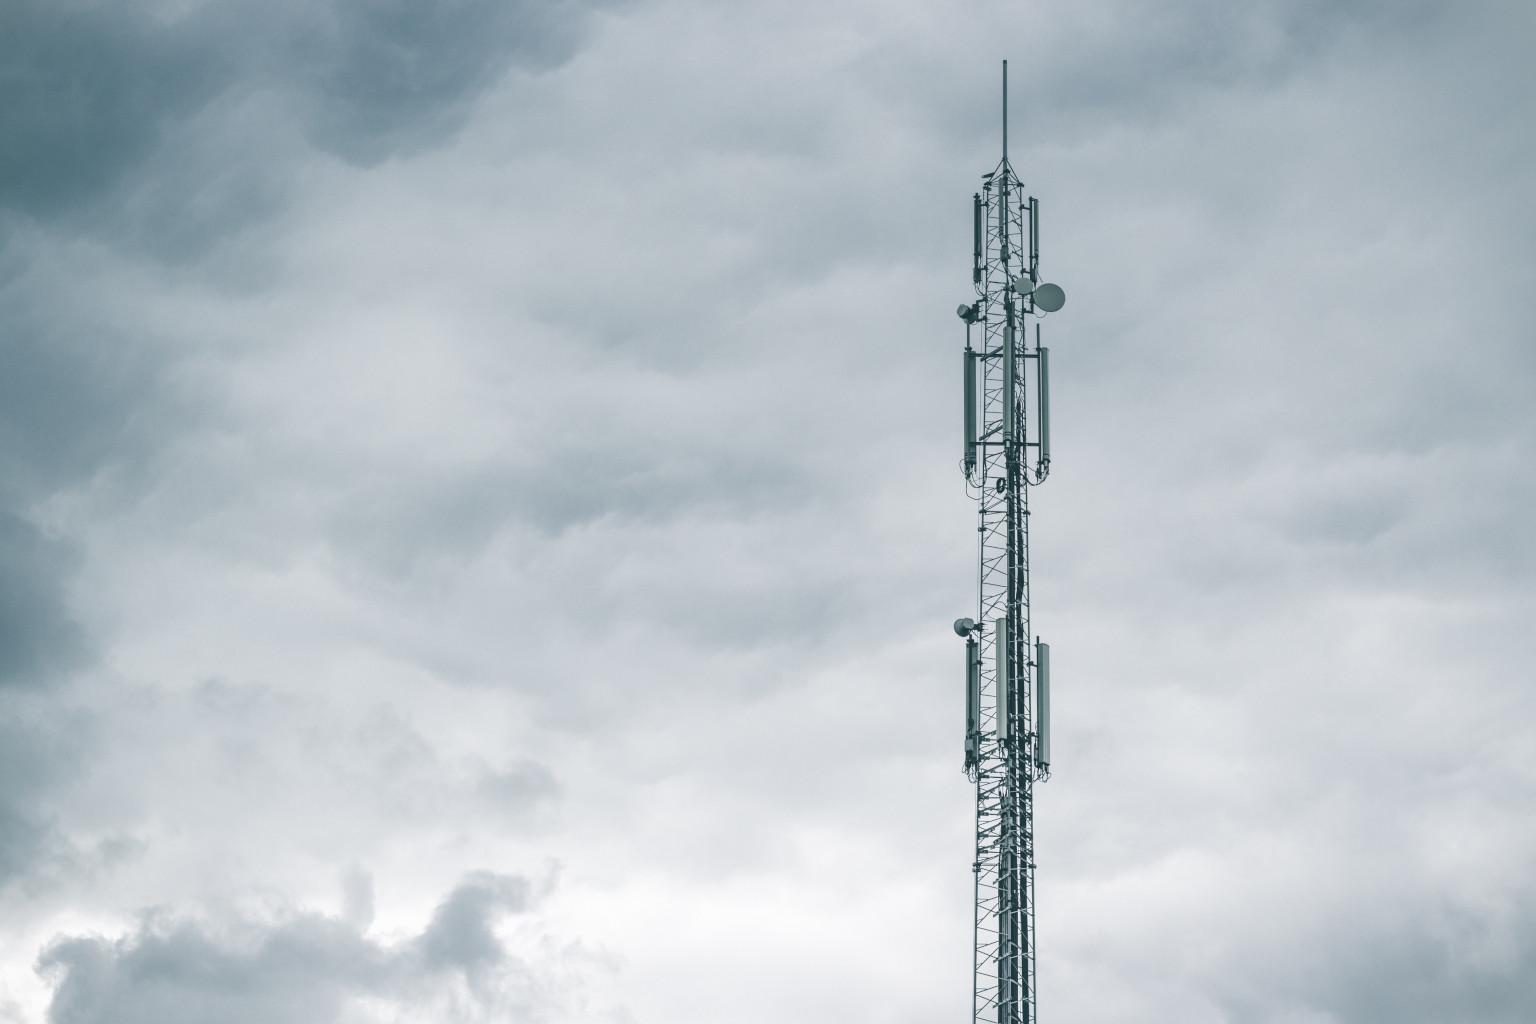 Gepardy Biznesu 2020 Telekomunikacji